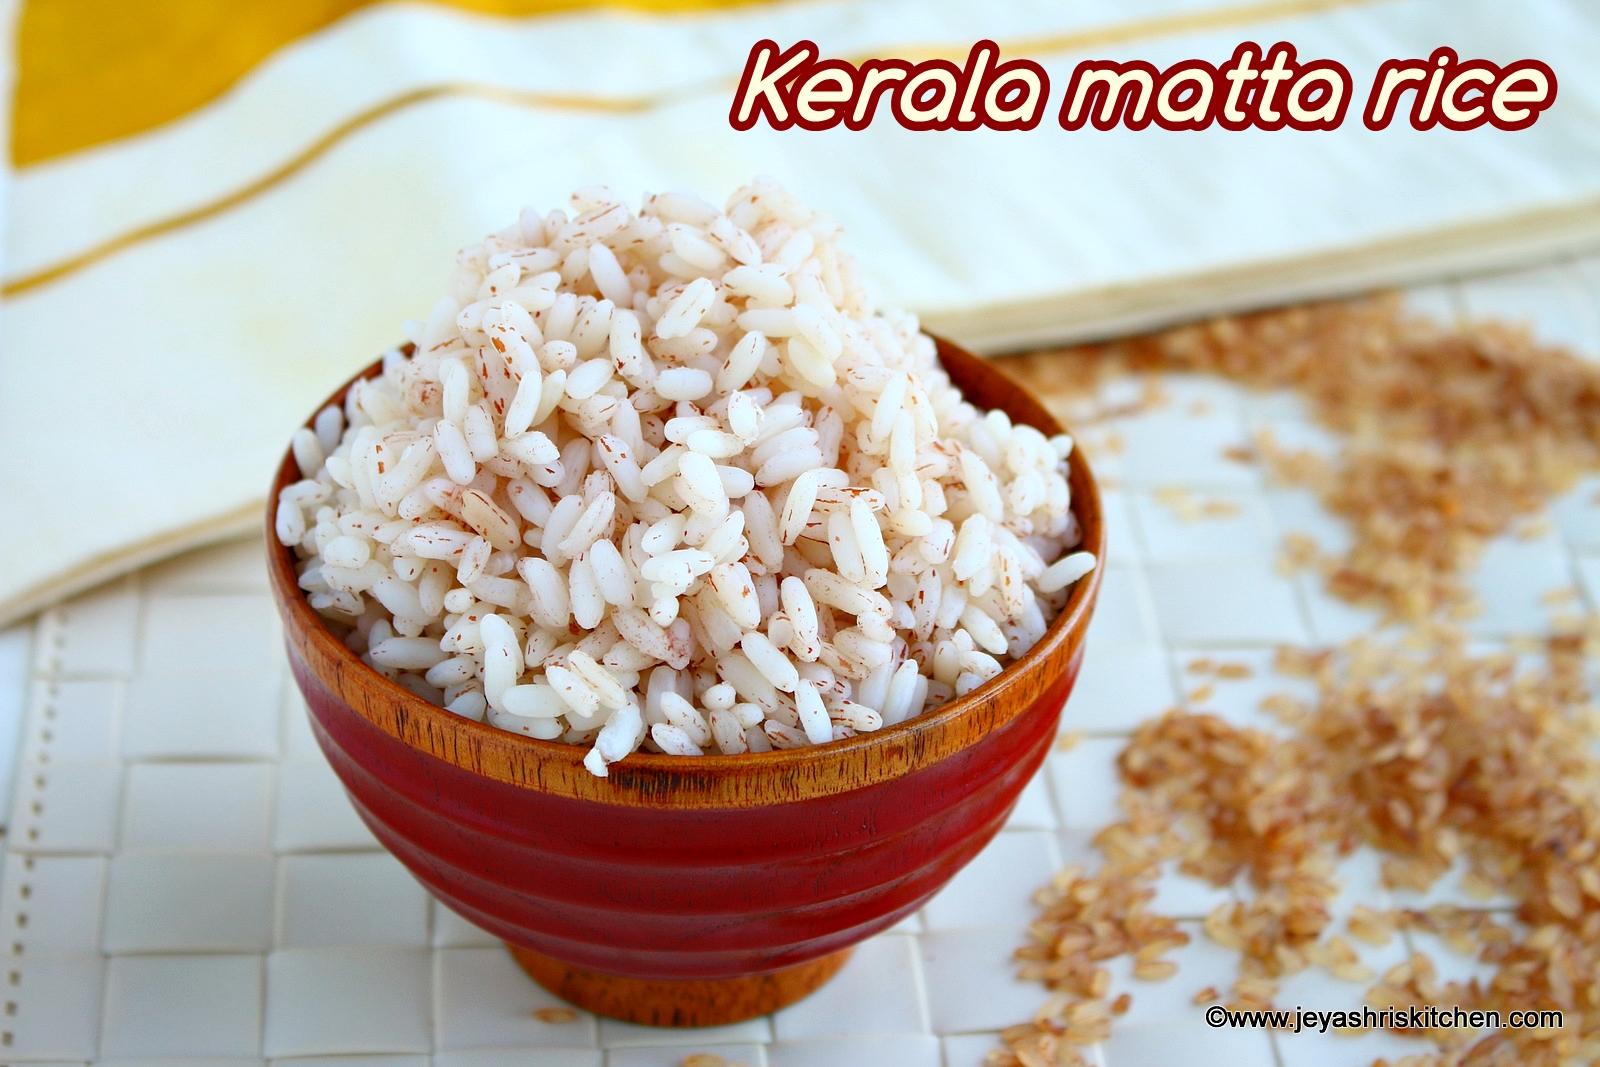 how to cook kerala matta rice pressure cooker method - Jeyashris Kitchen